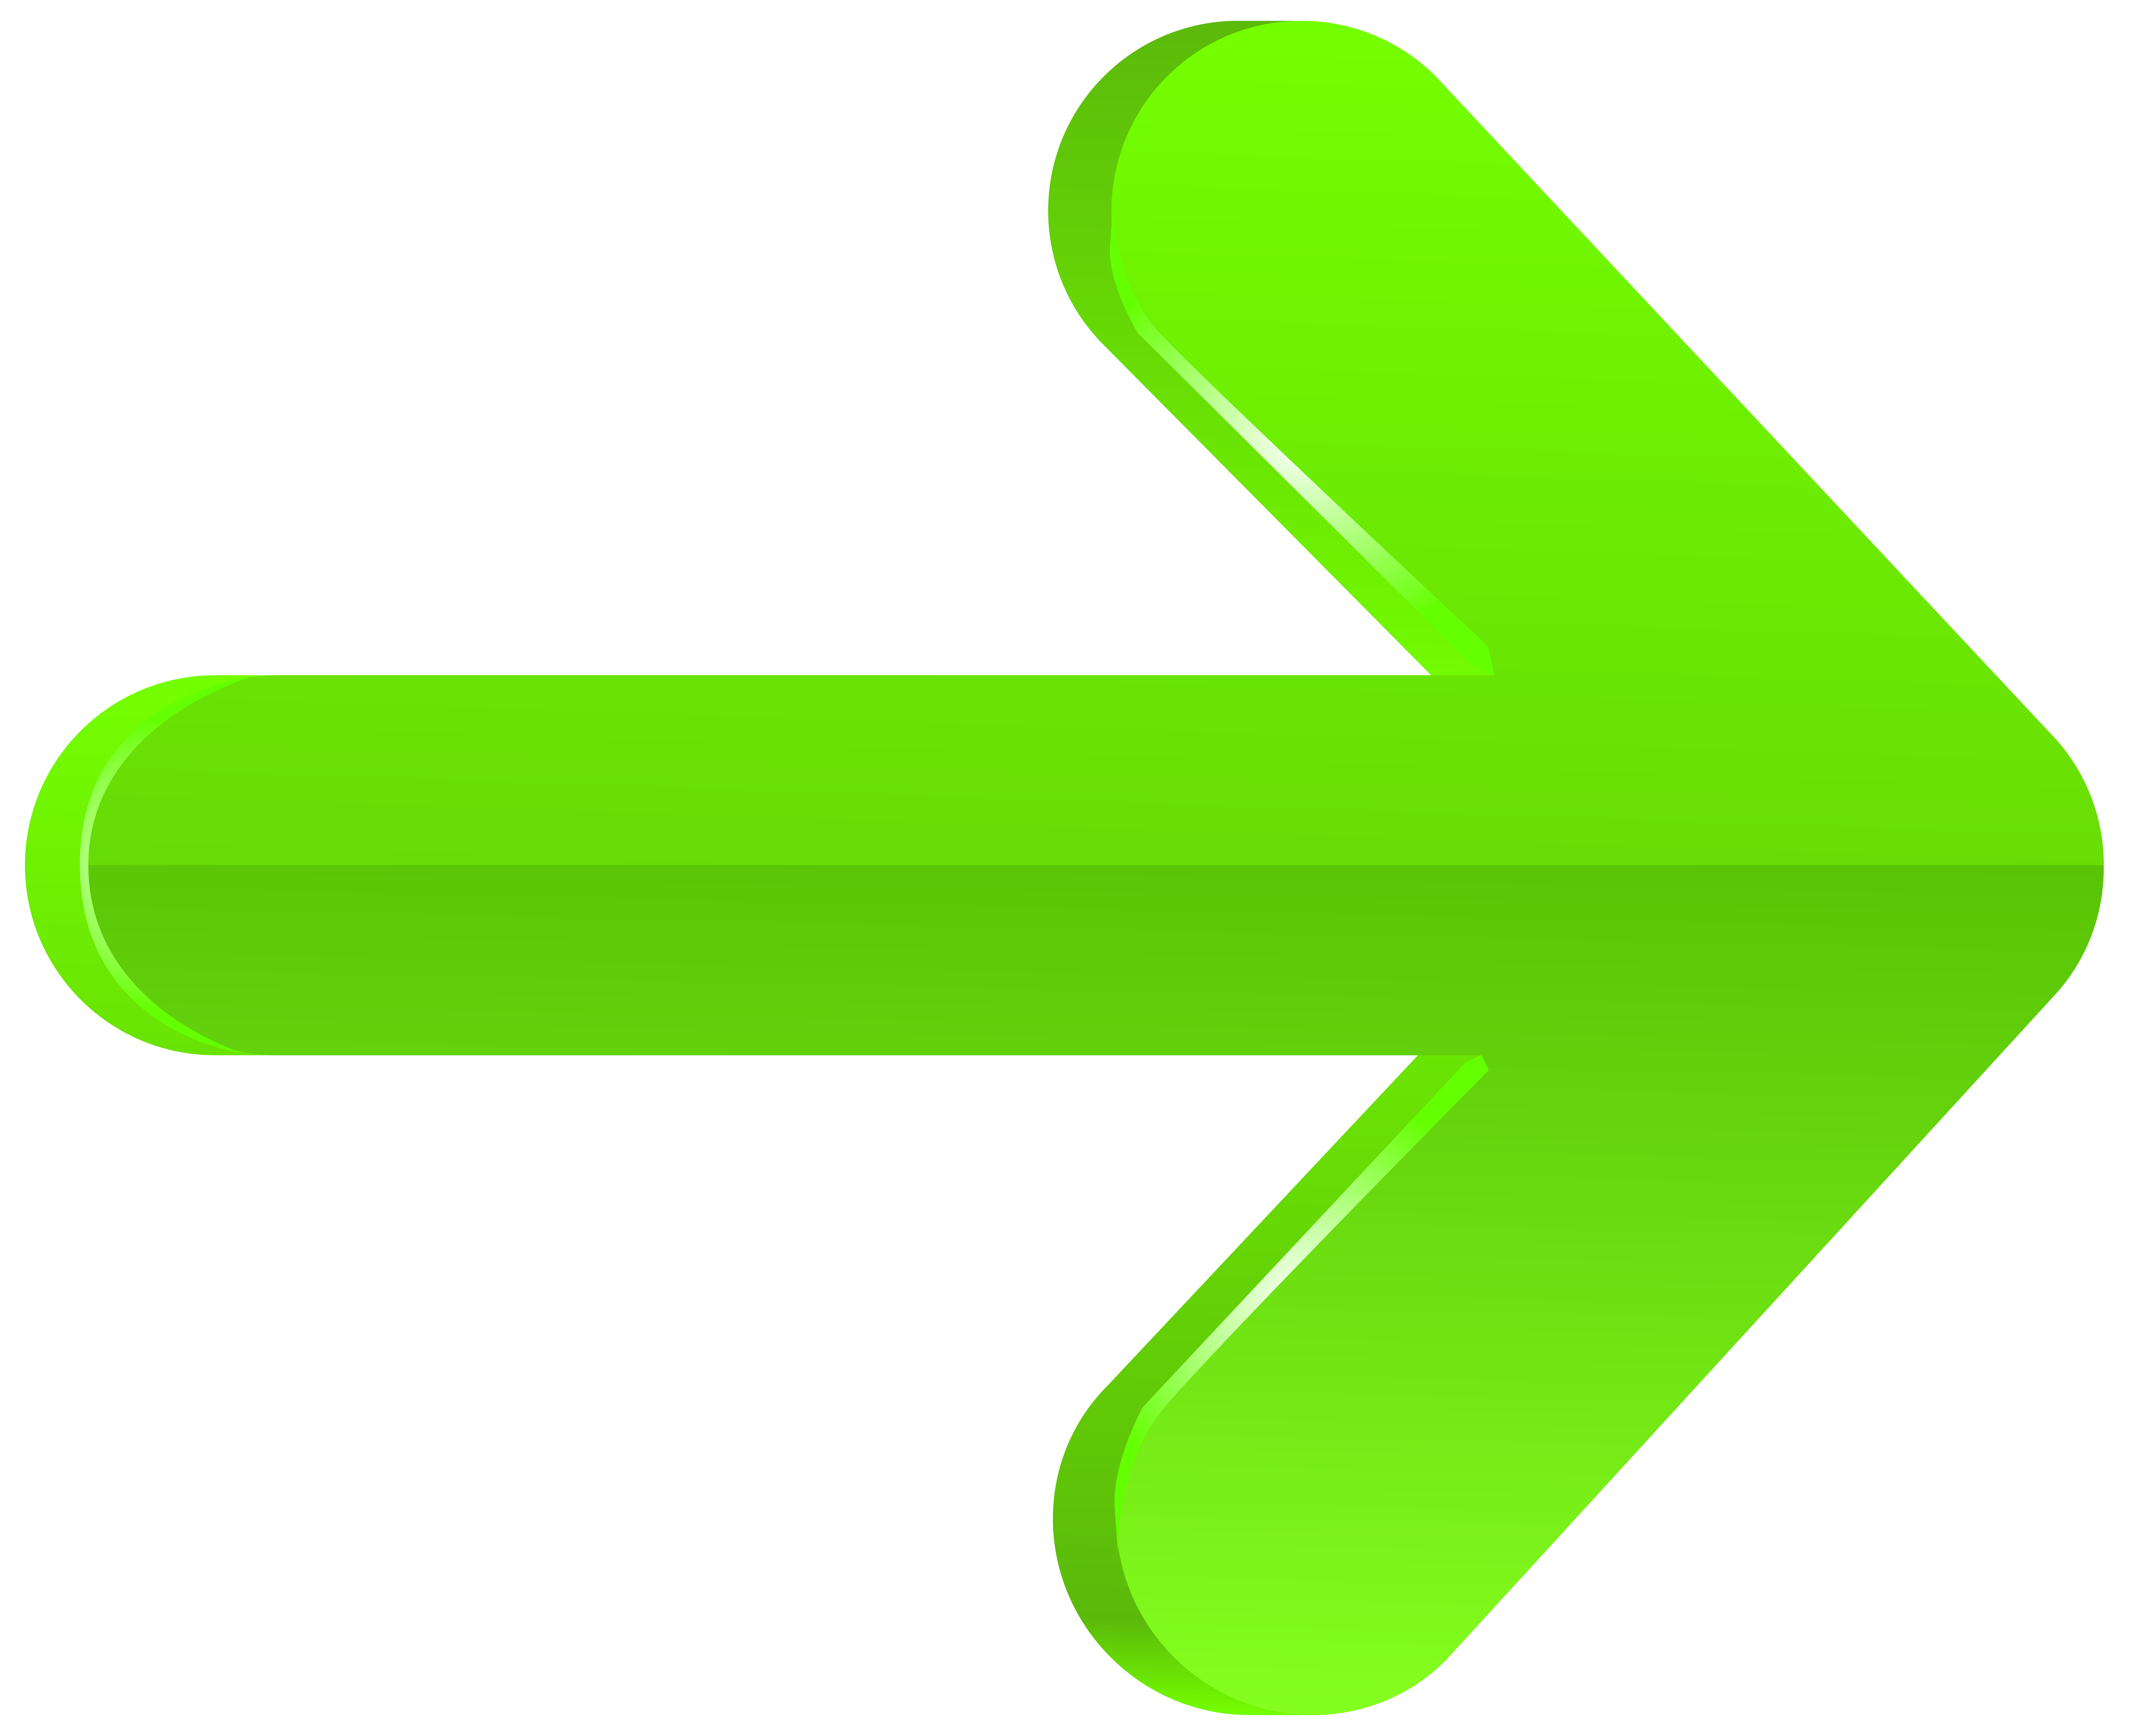 Finger clipart arrow. Right green png transparent